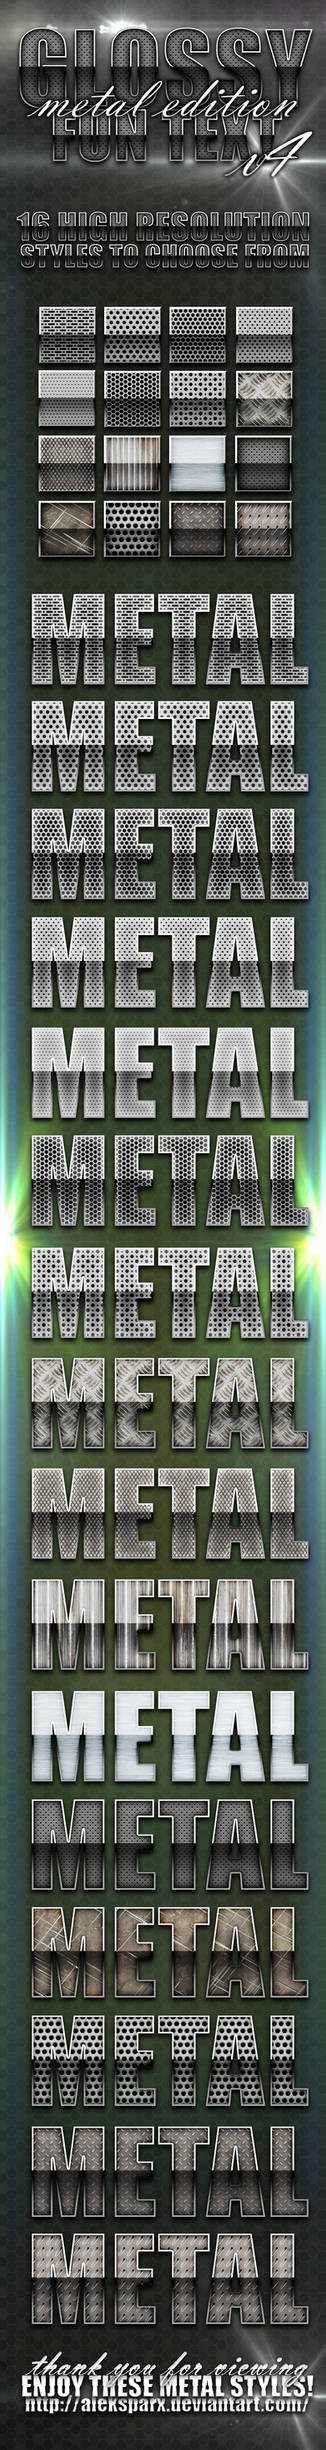 Genuine Glossy Metal Style